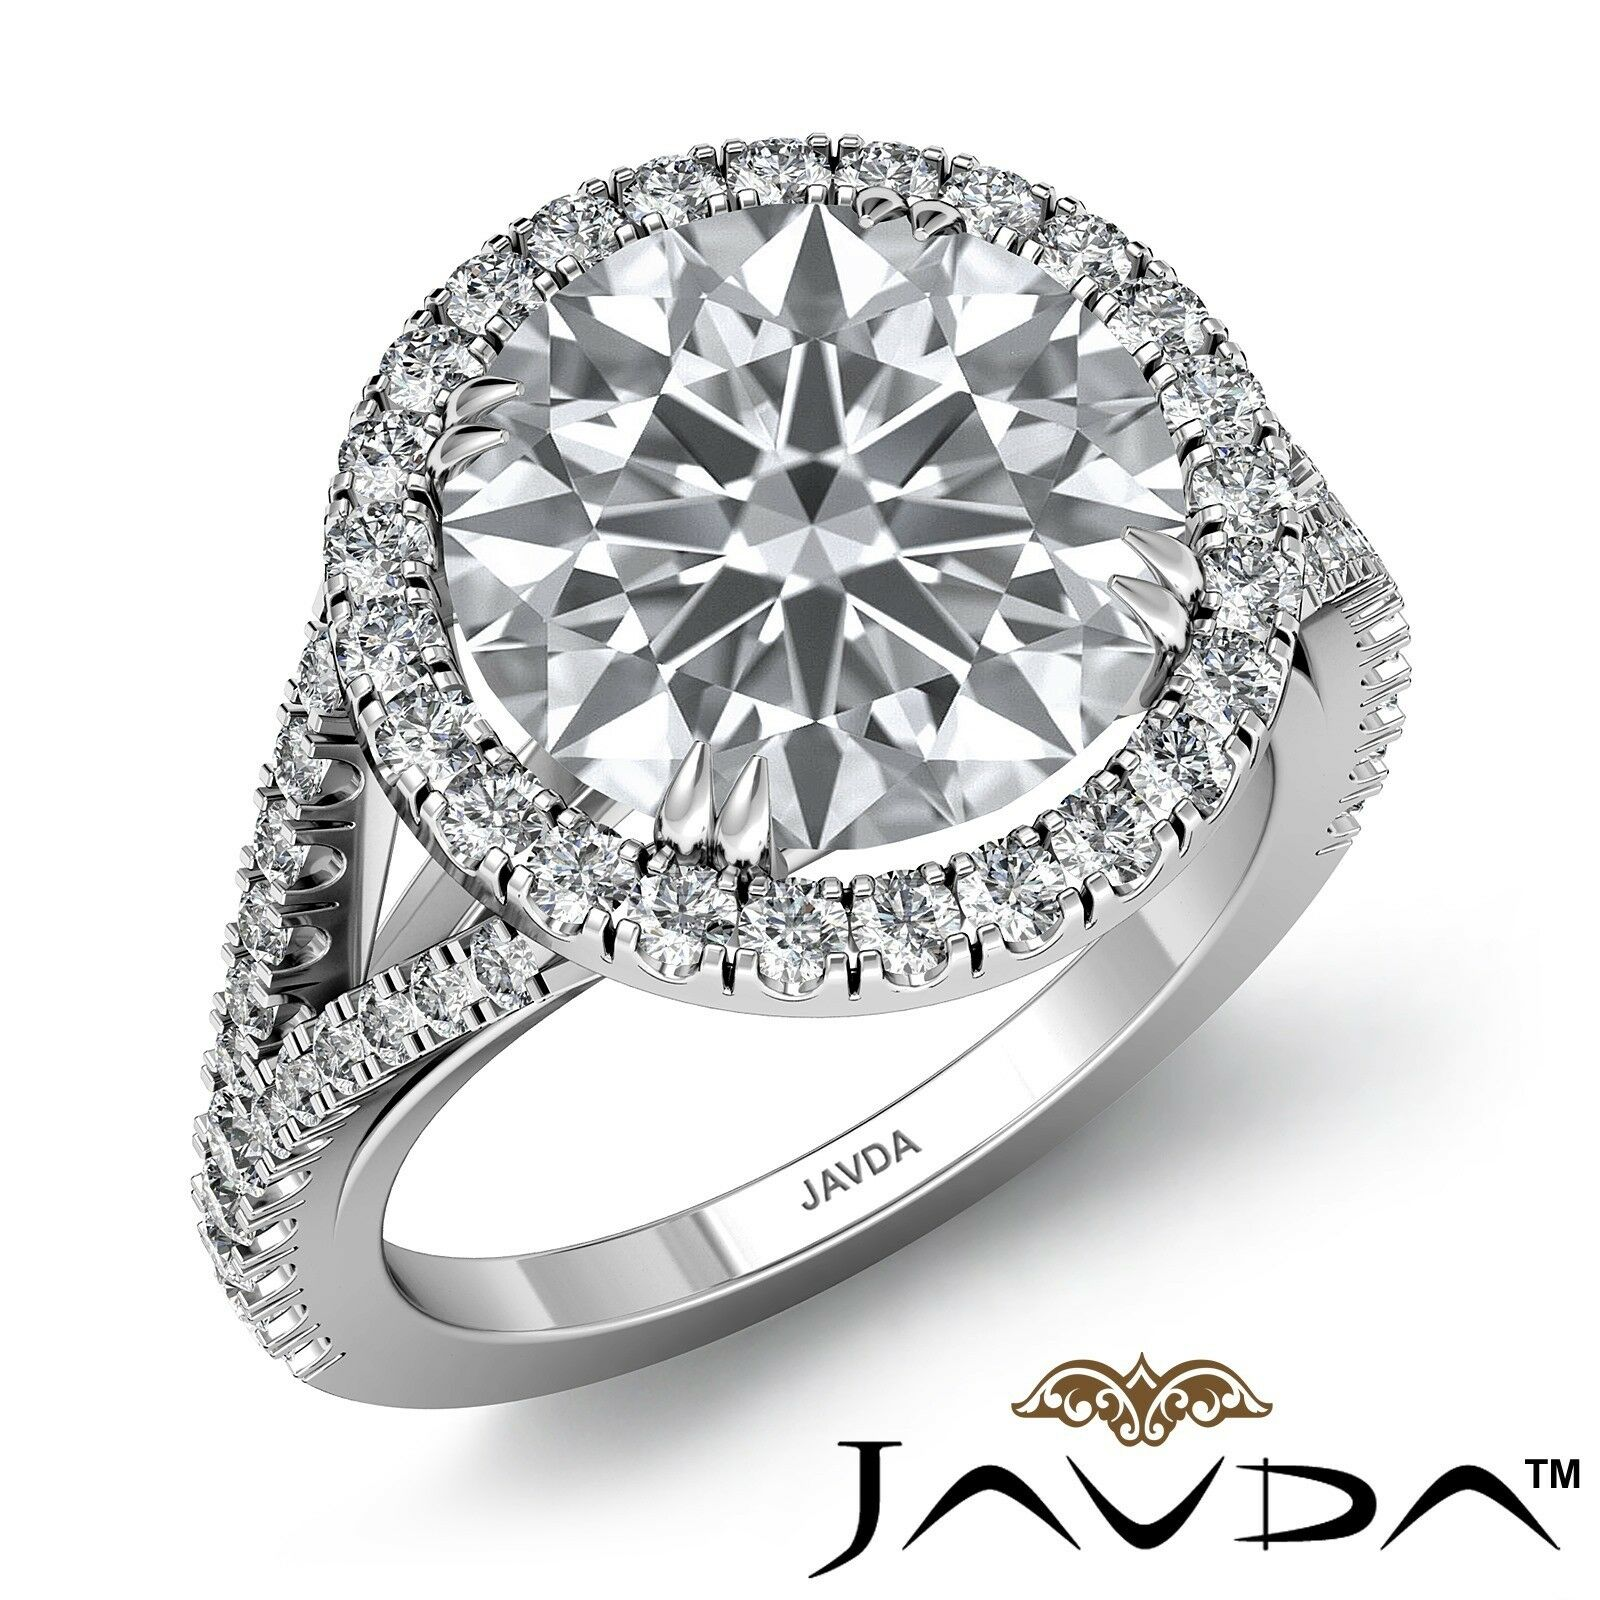 3.75ctw Halo Pave Set Round Diamond Engagement Ring GIA J-SI1 Platinum Women New